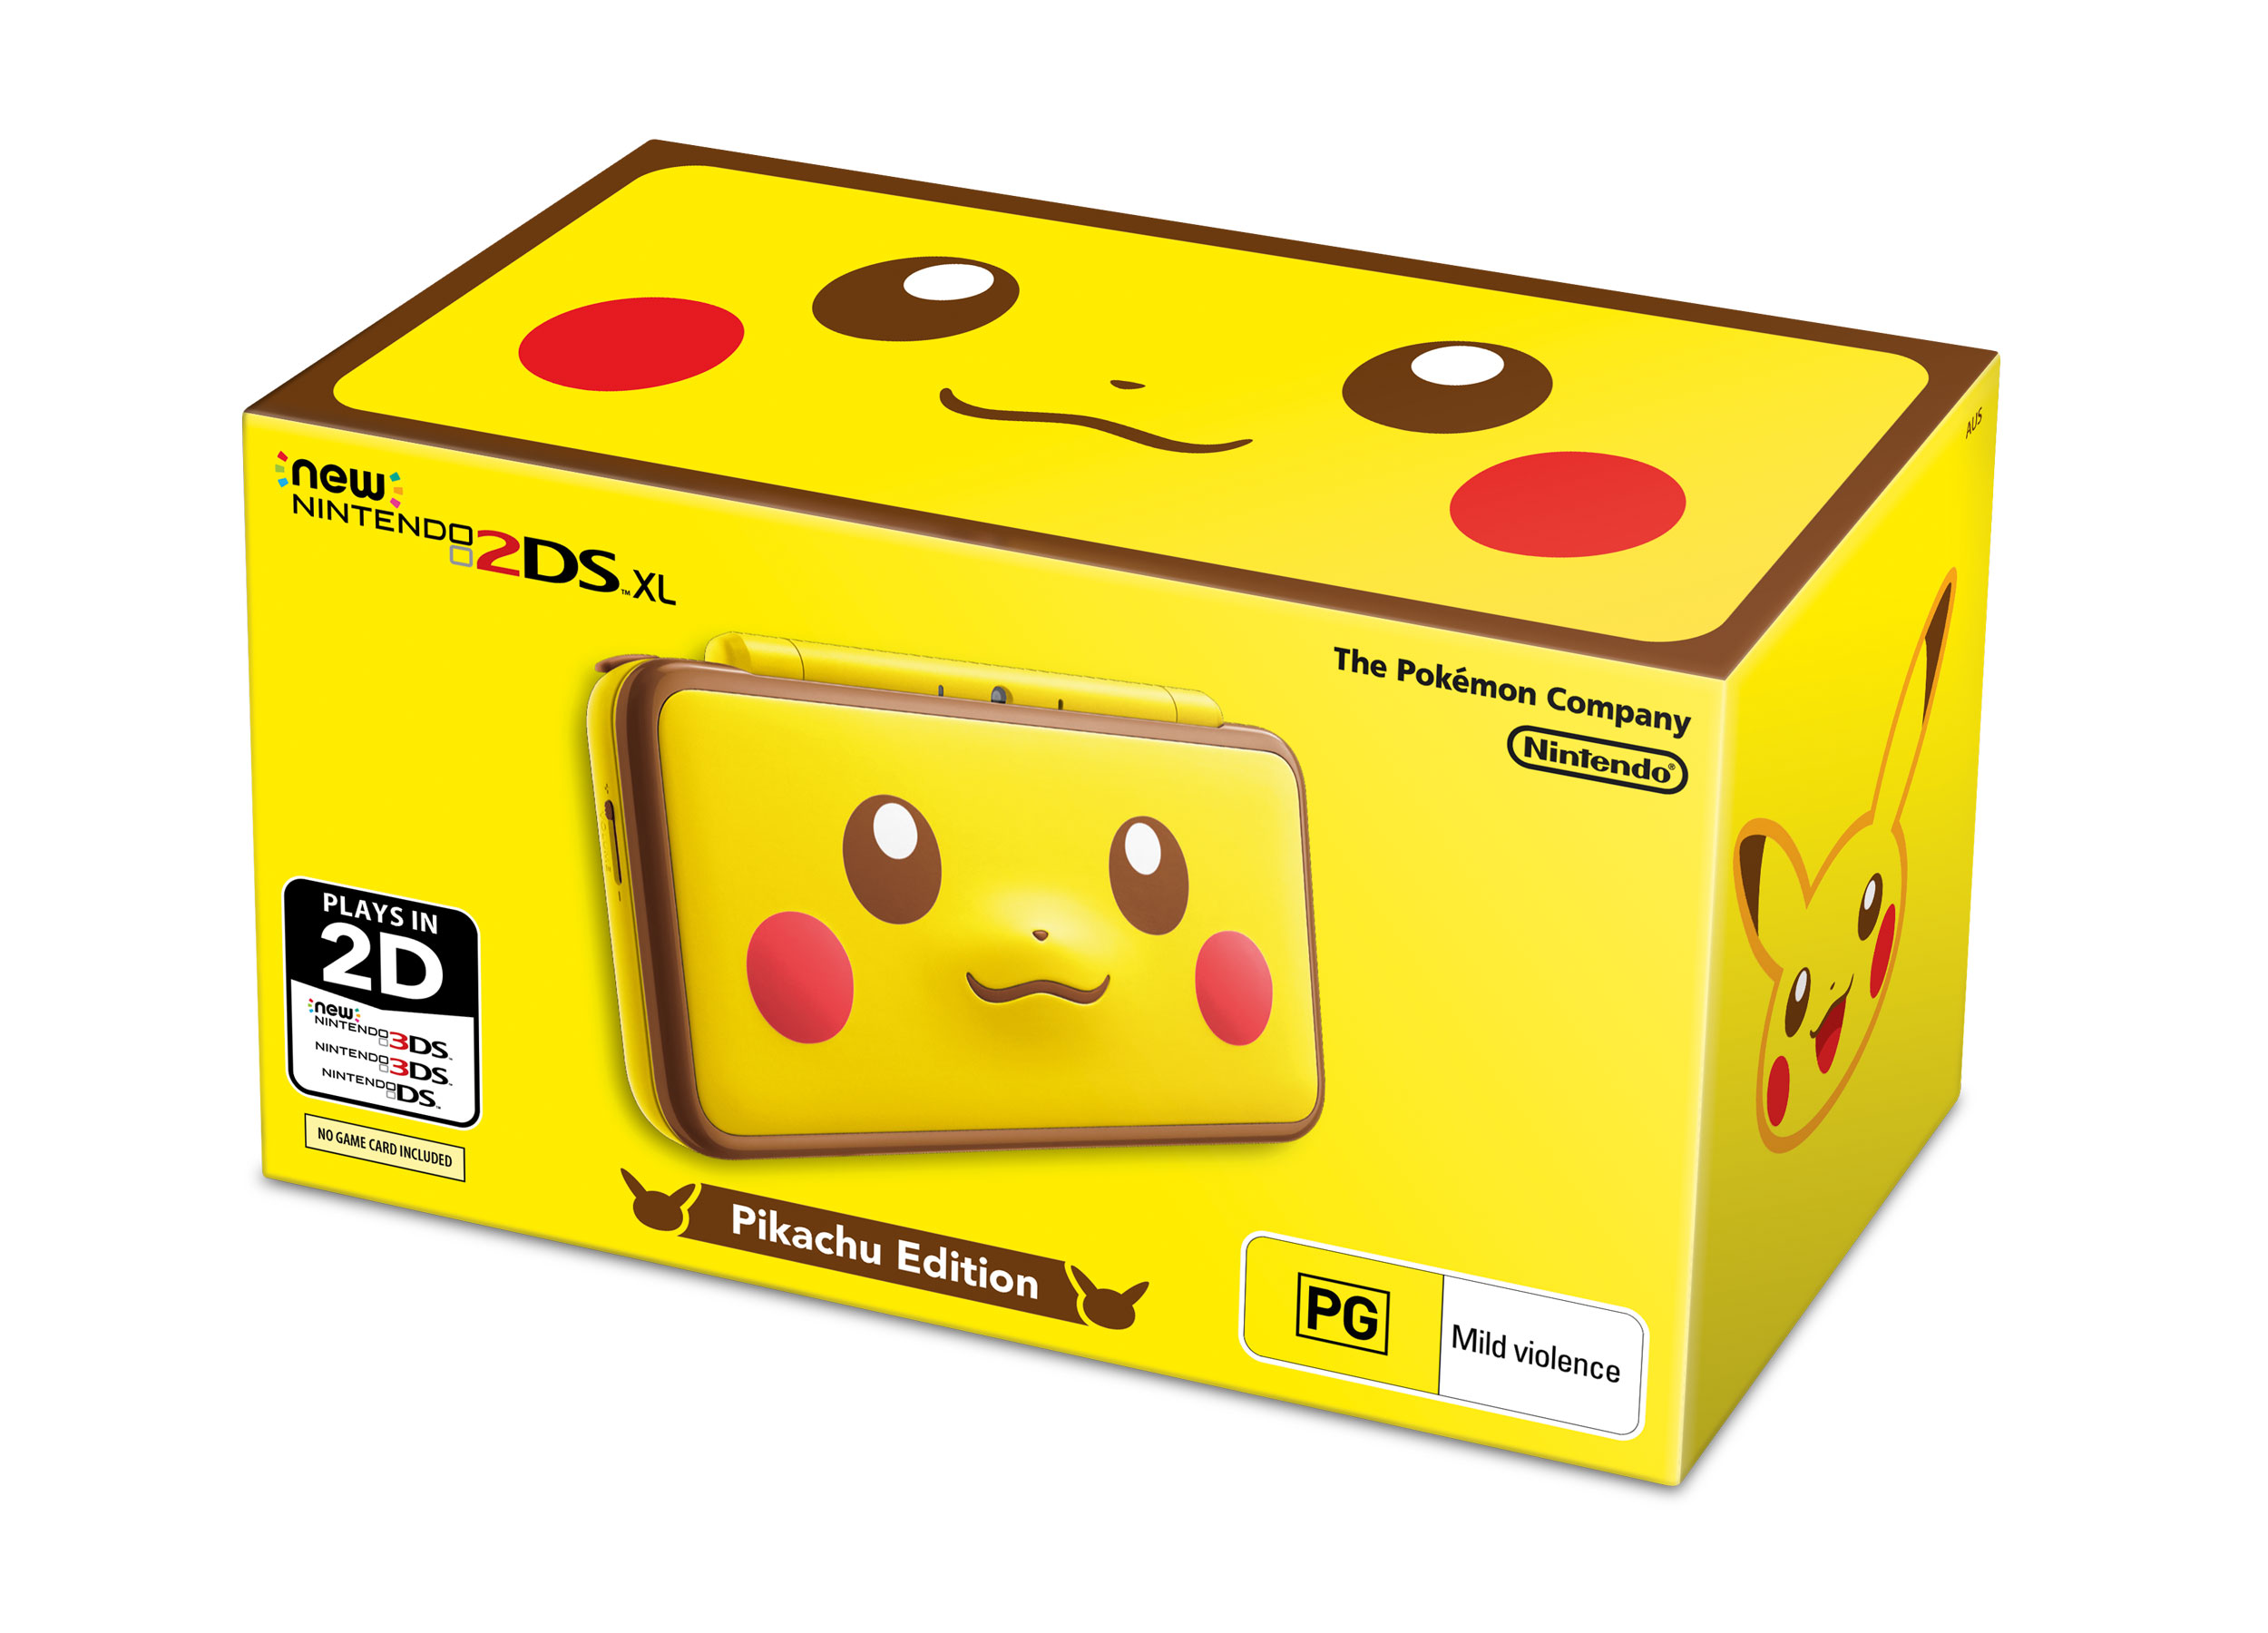 Grab this New Pikachu 2DS XL on January 26 screenshot